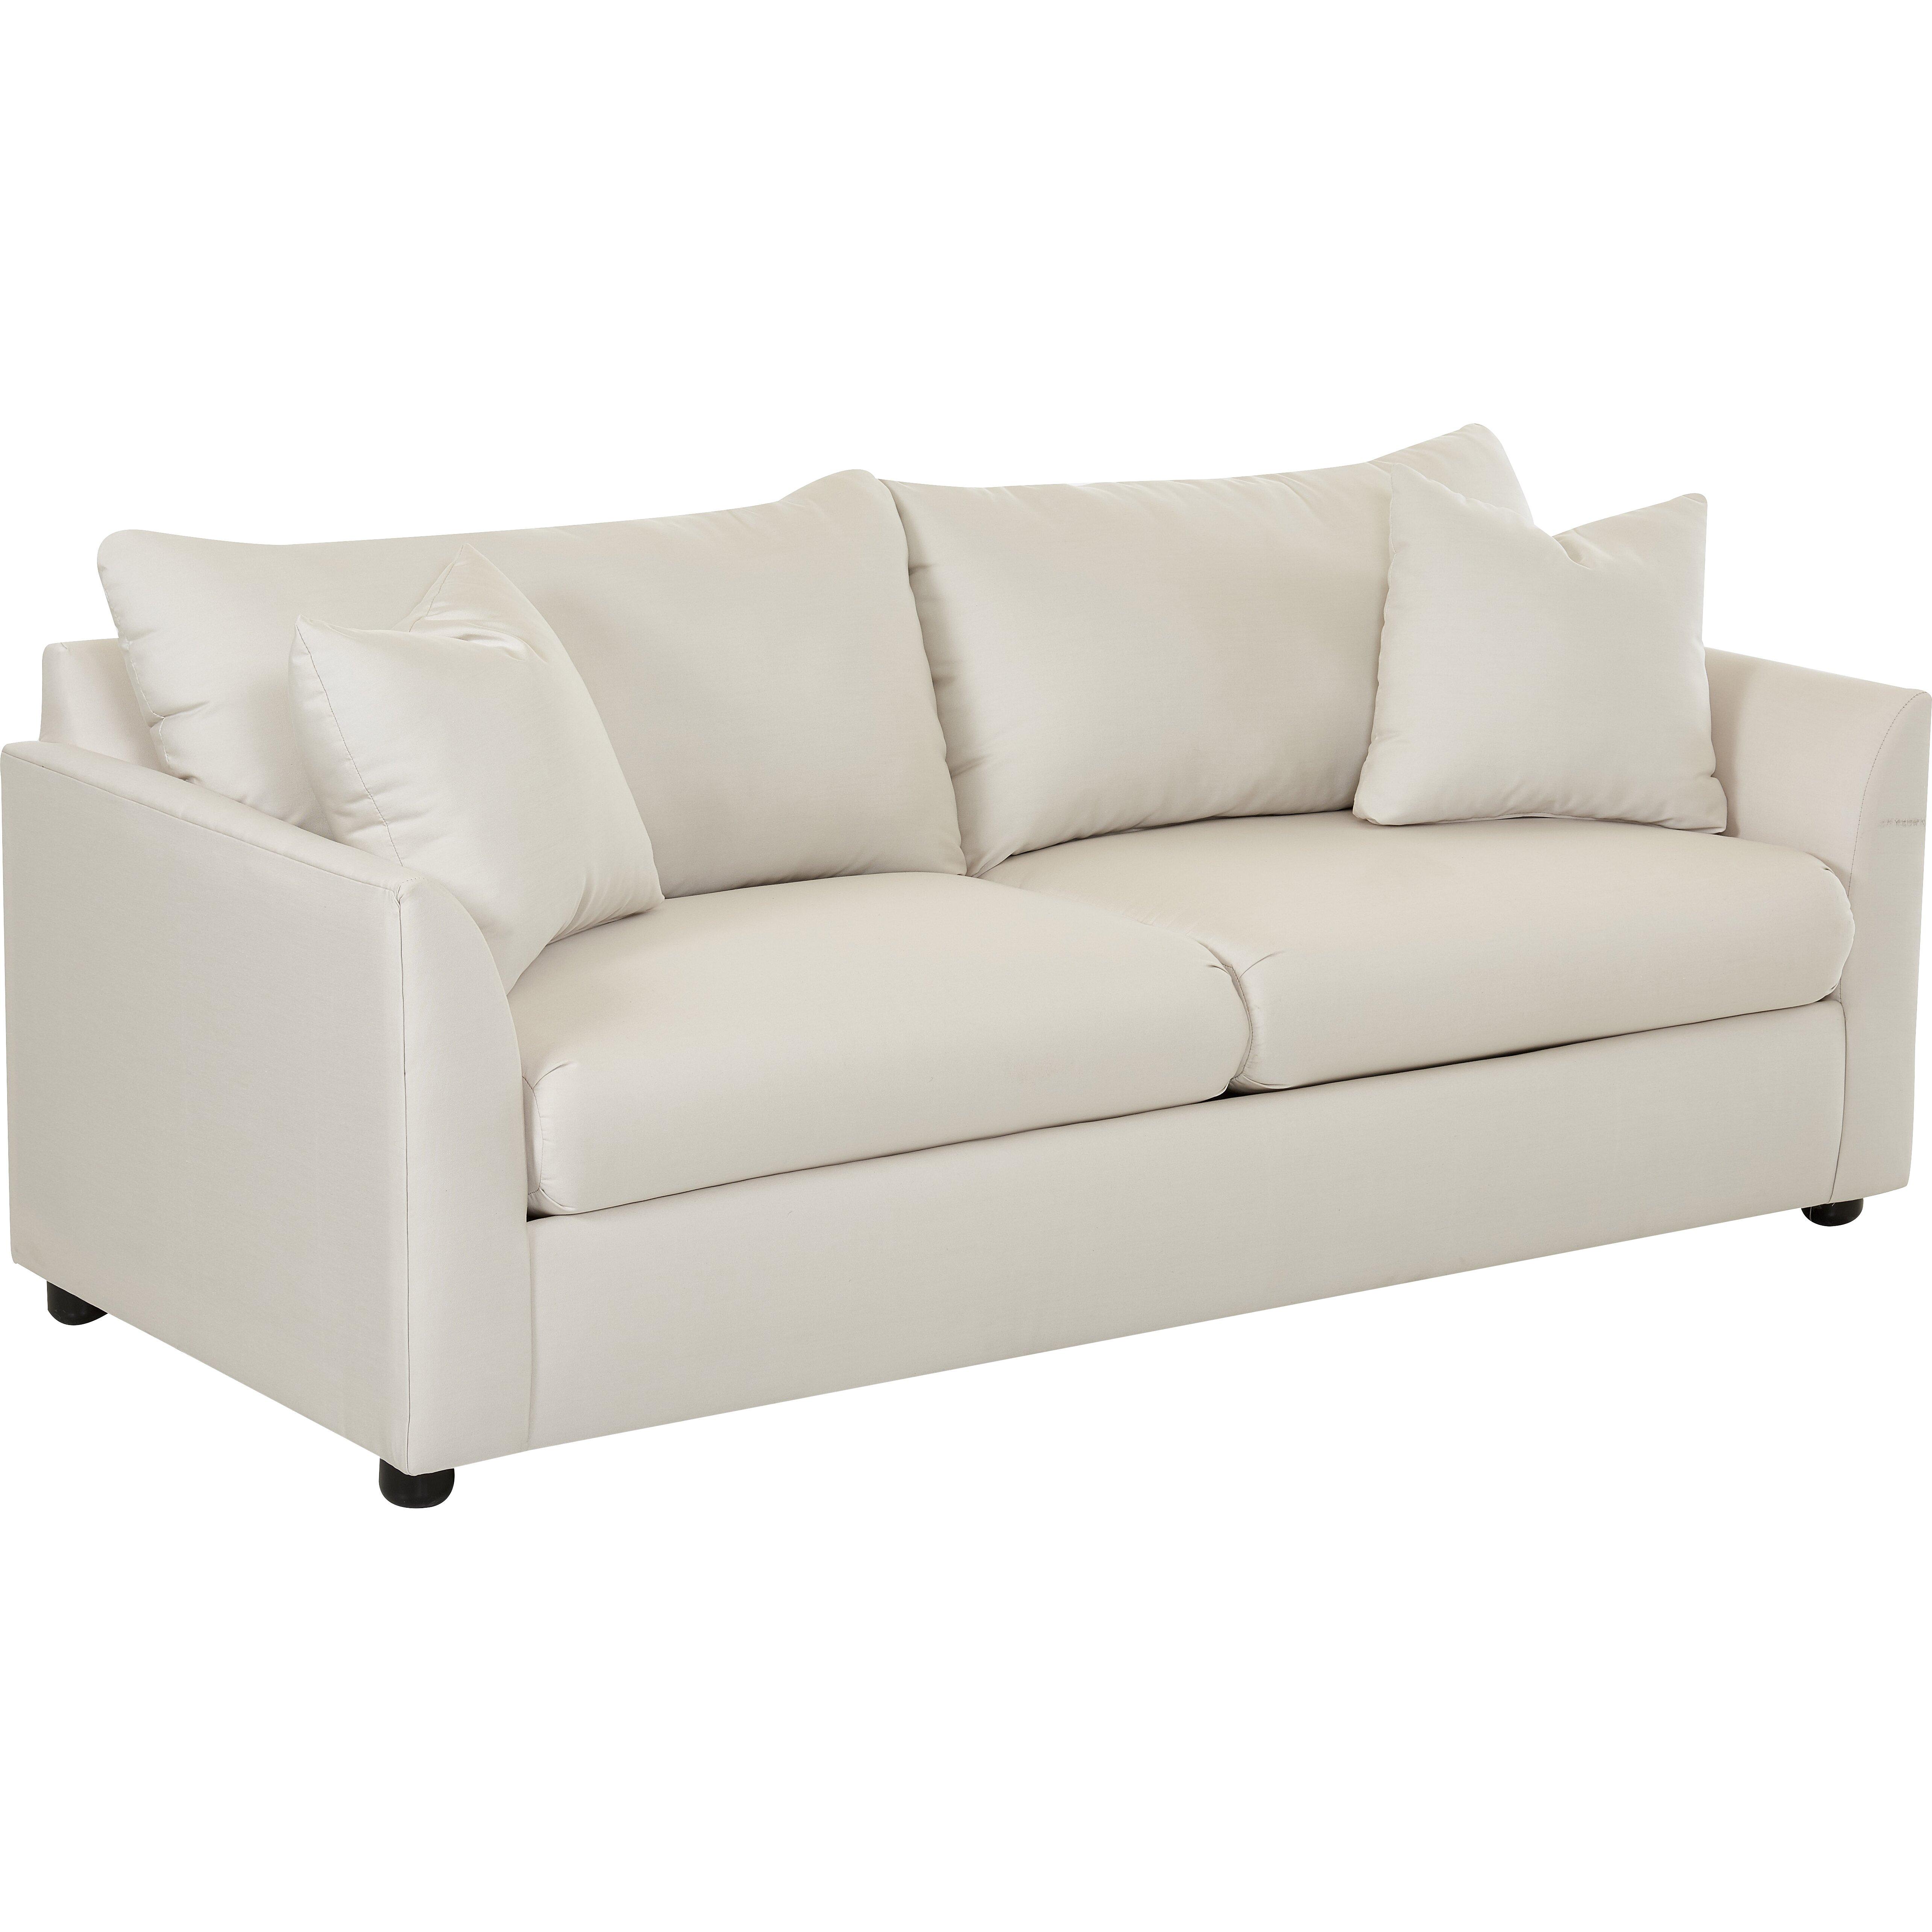 Klaussner Furniture Kaylee Sofa   Wayfair.ca